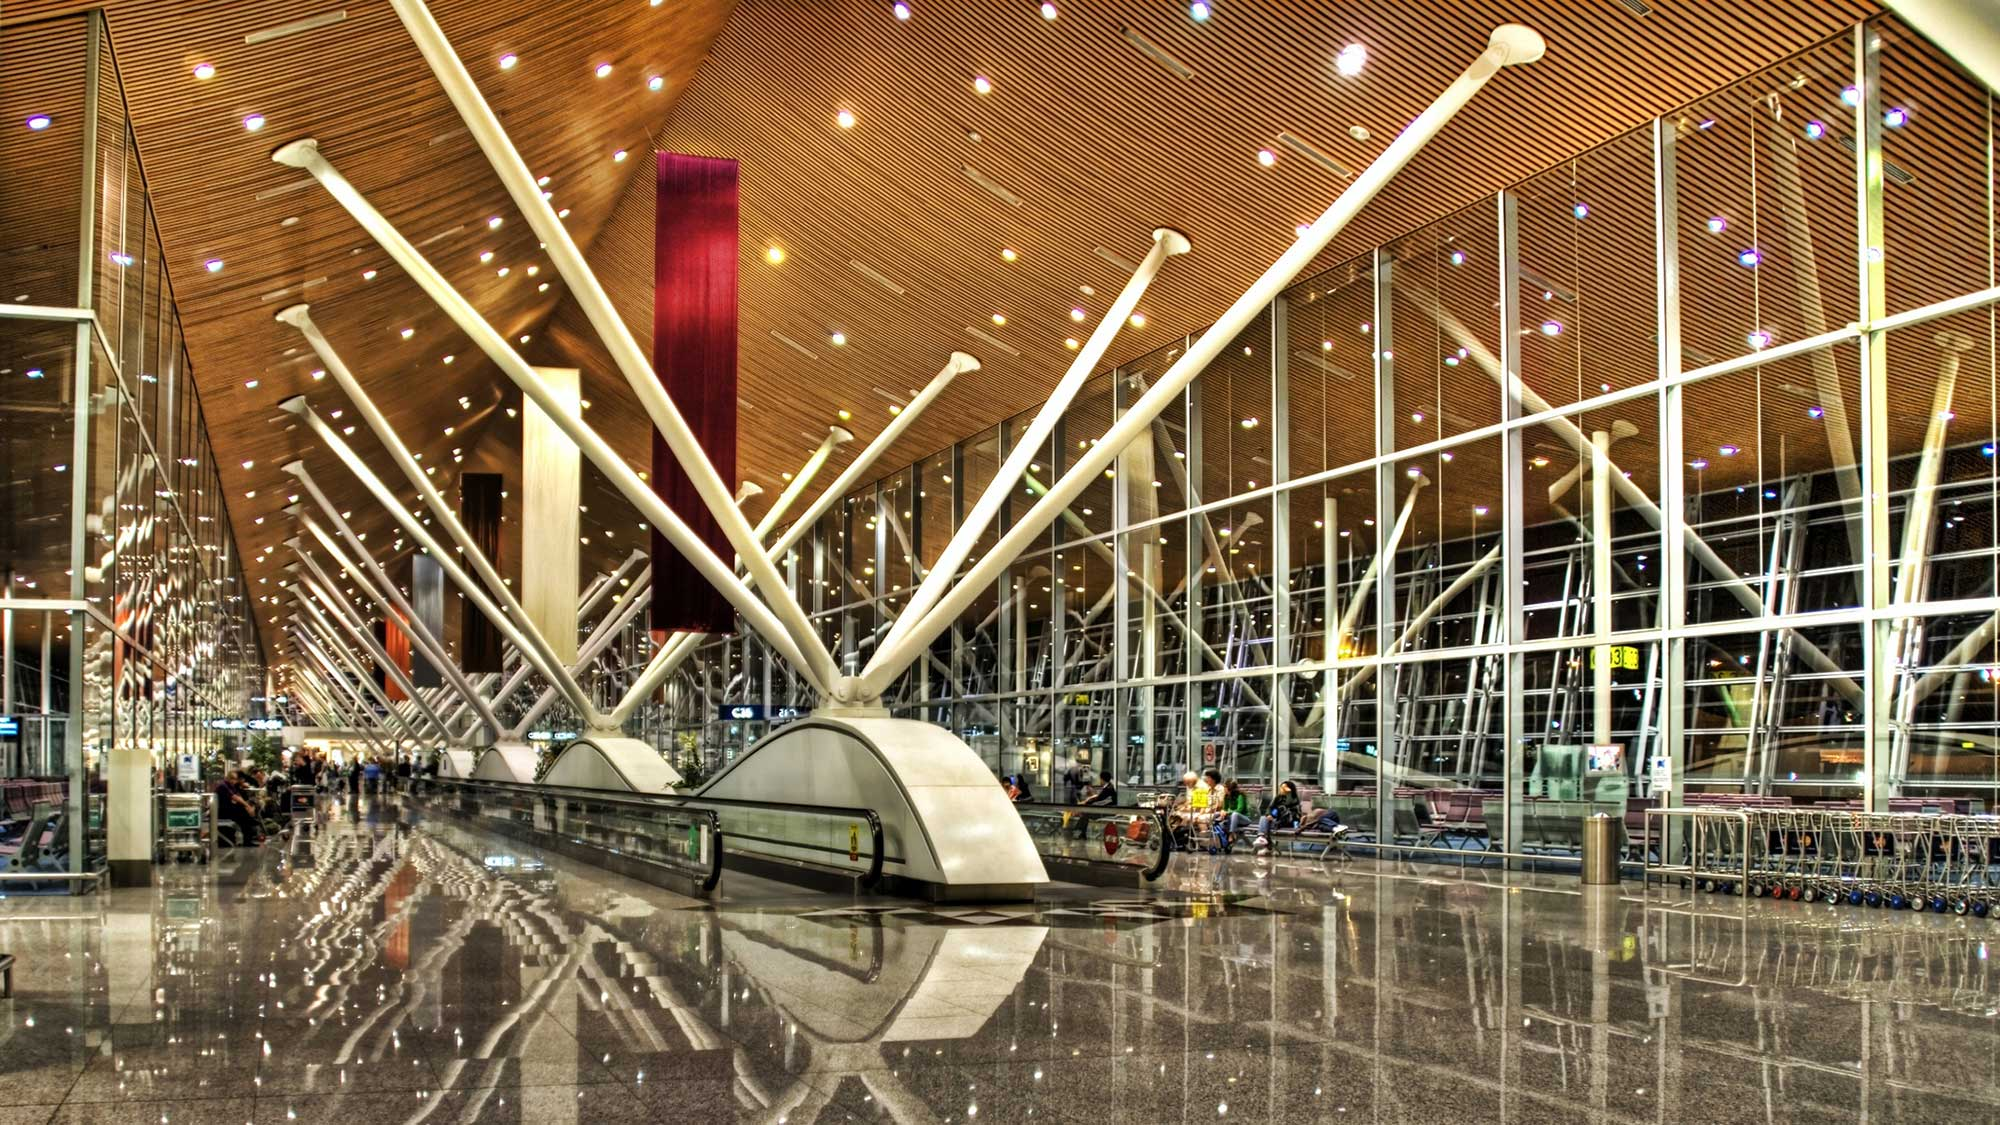 فرودگاه کوالالامپور